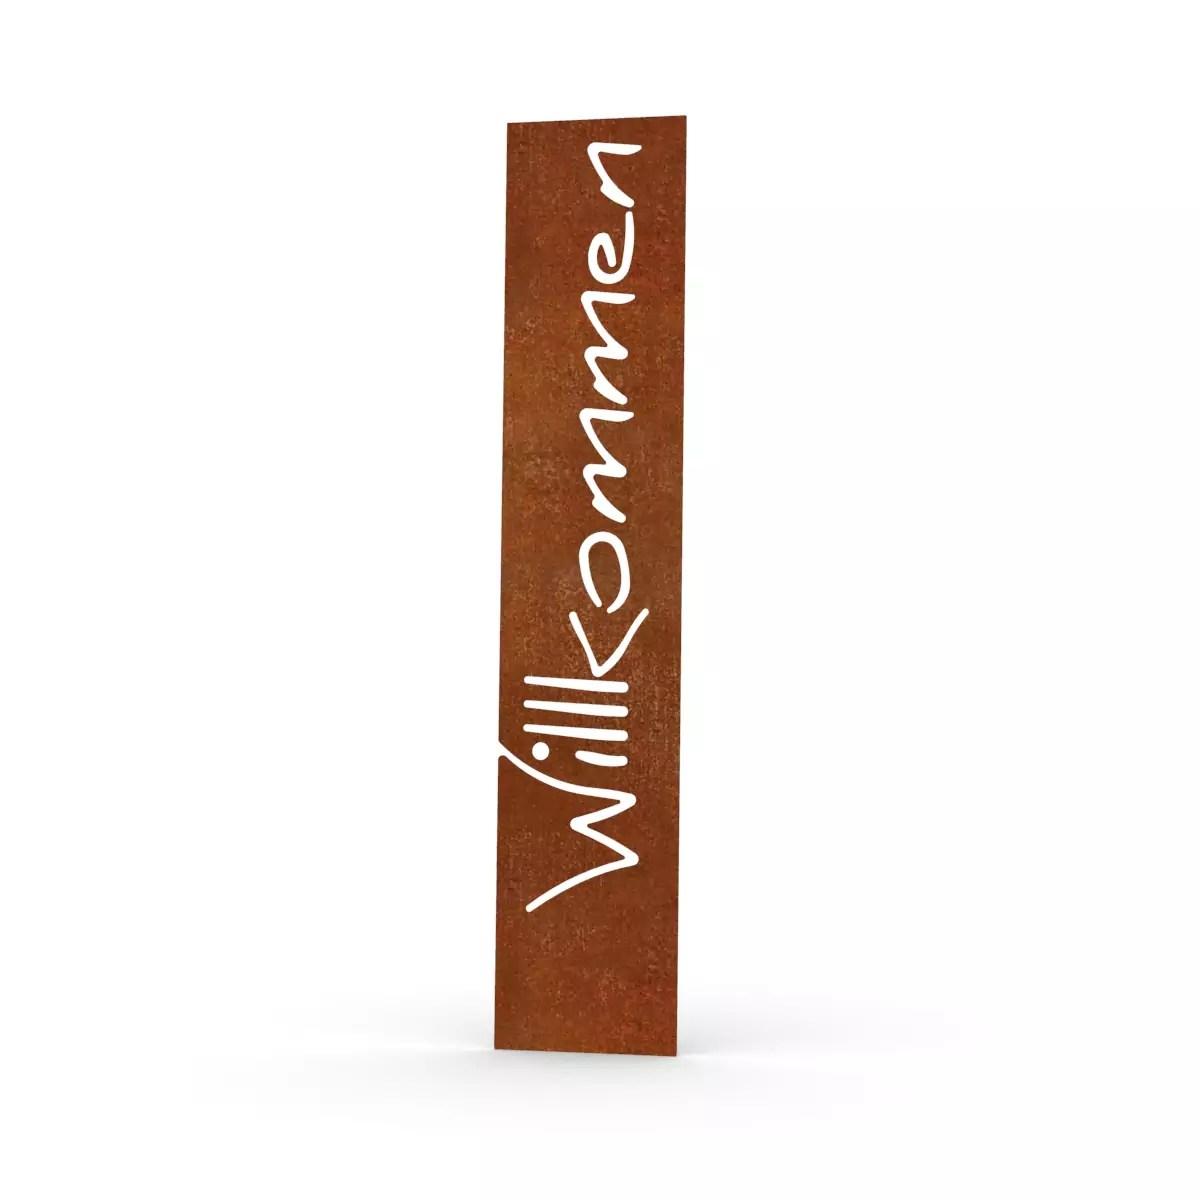 Details about  /MEILLER MetallDesign I STELEN AUS STAHL I 125 cm steckbar I 100/% MADE IN GERMANY